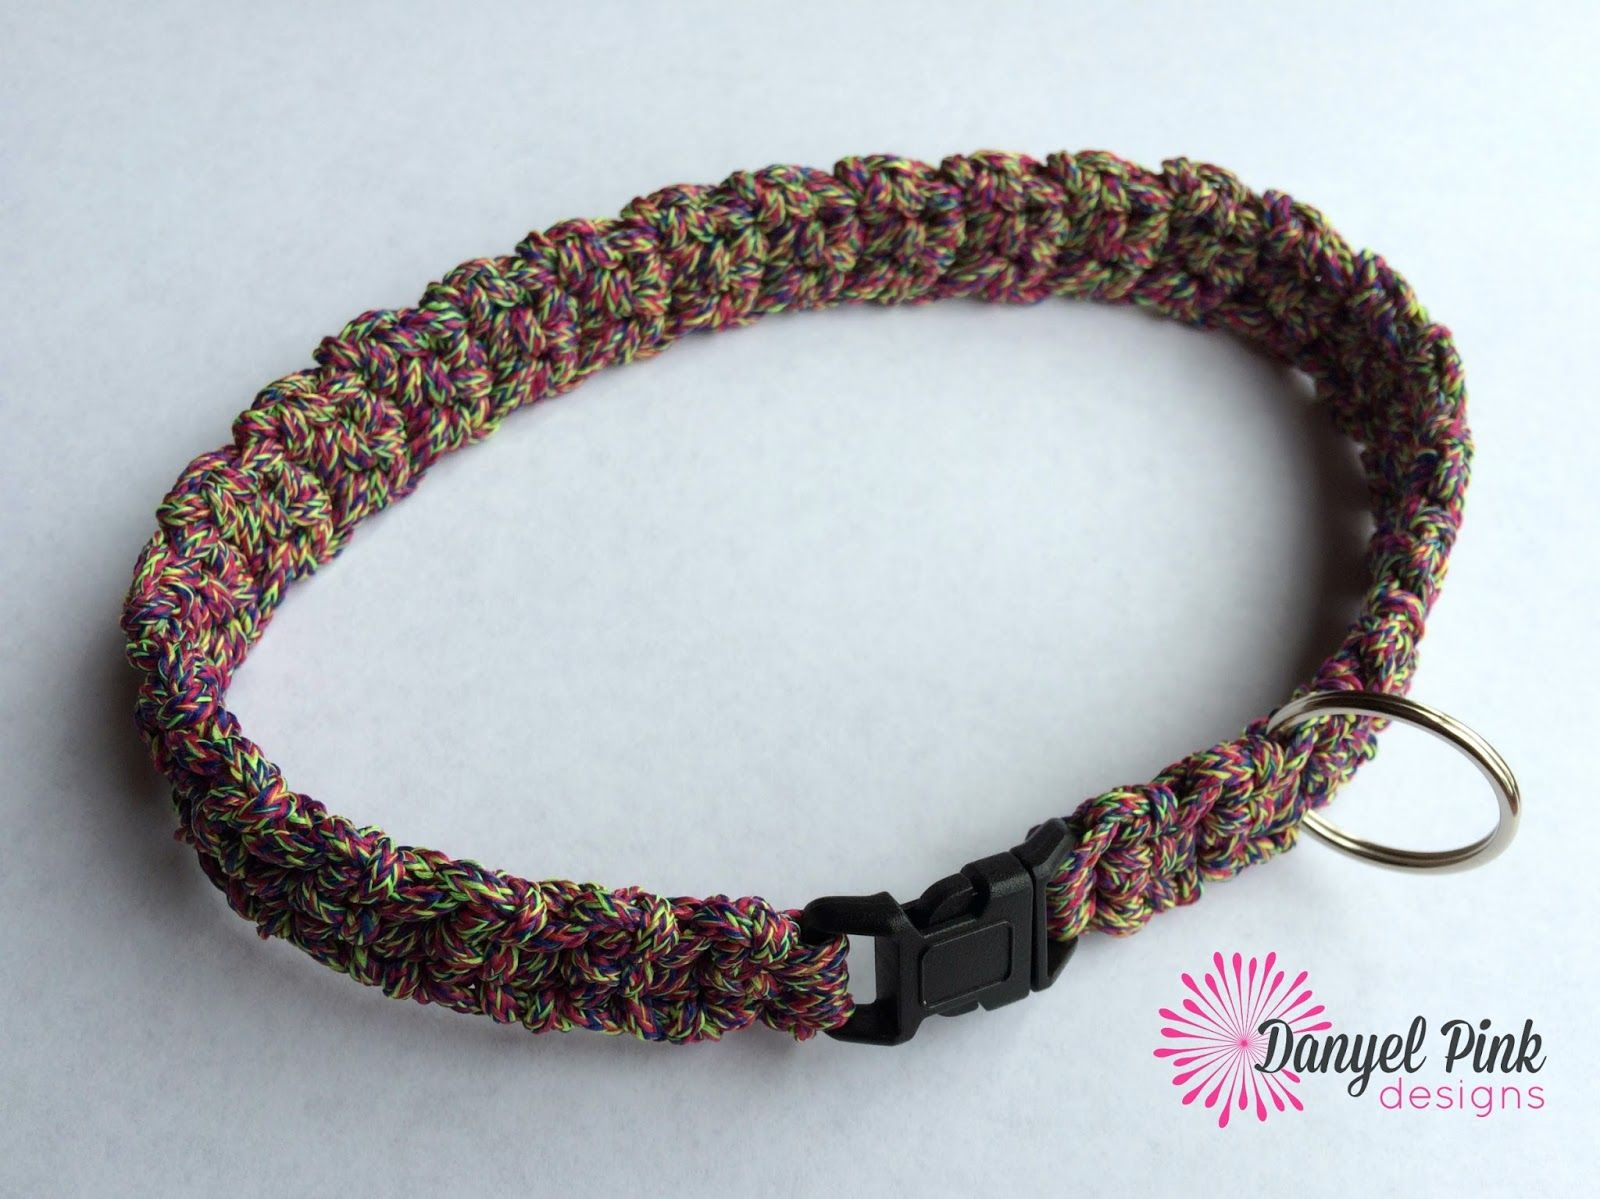 Danyel Pink Designs: FREE Crochet Pattern - Cordial Pet Collar | Pet ...